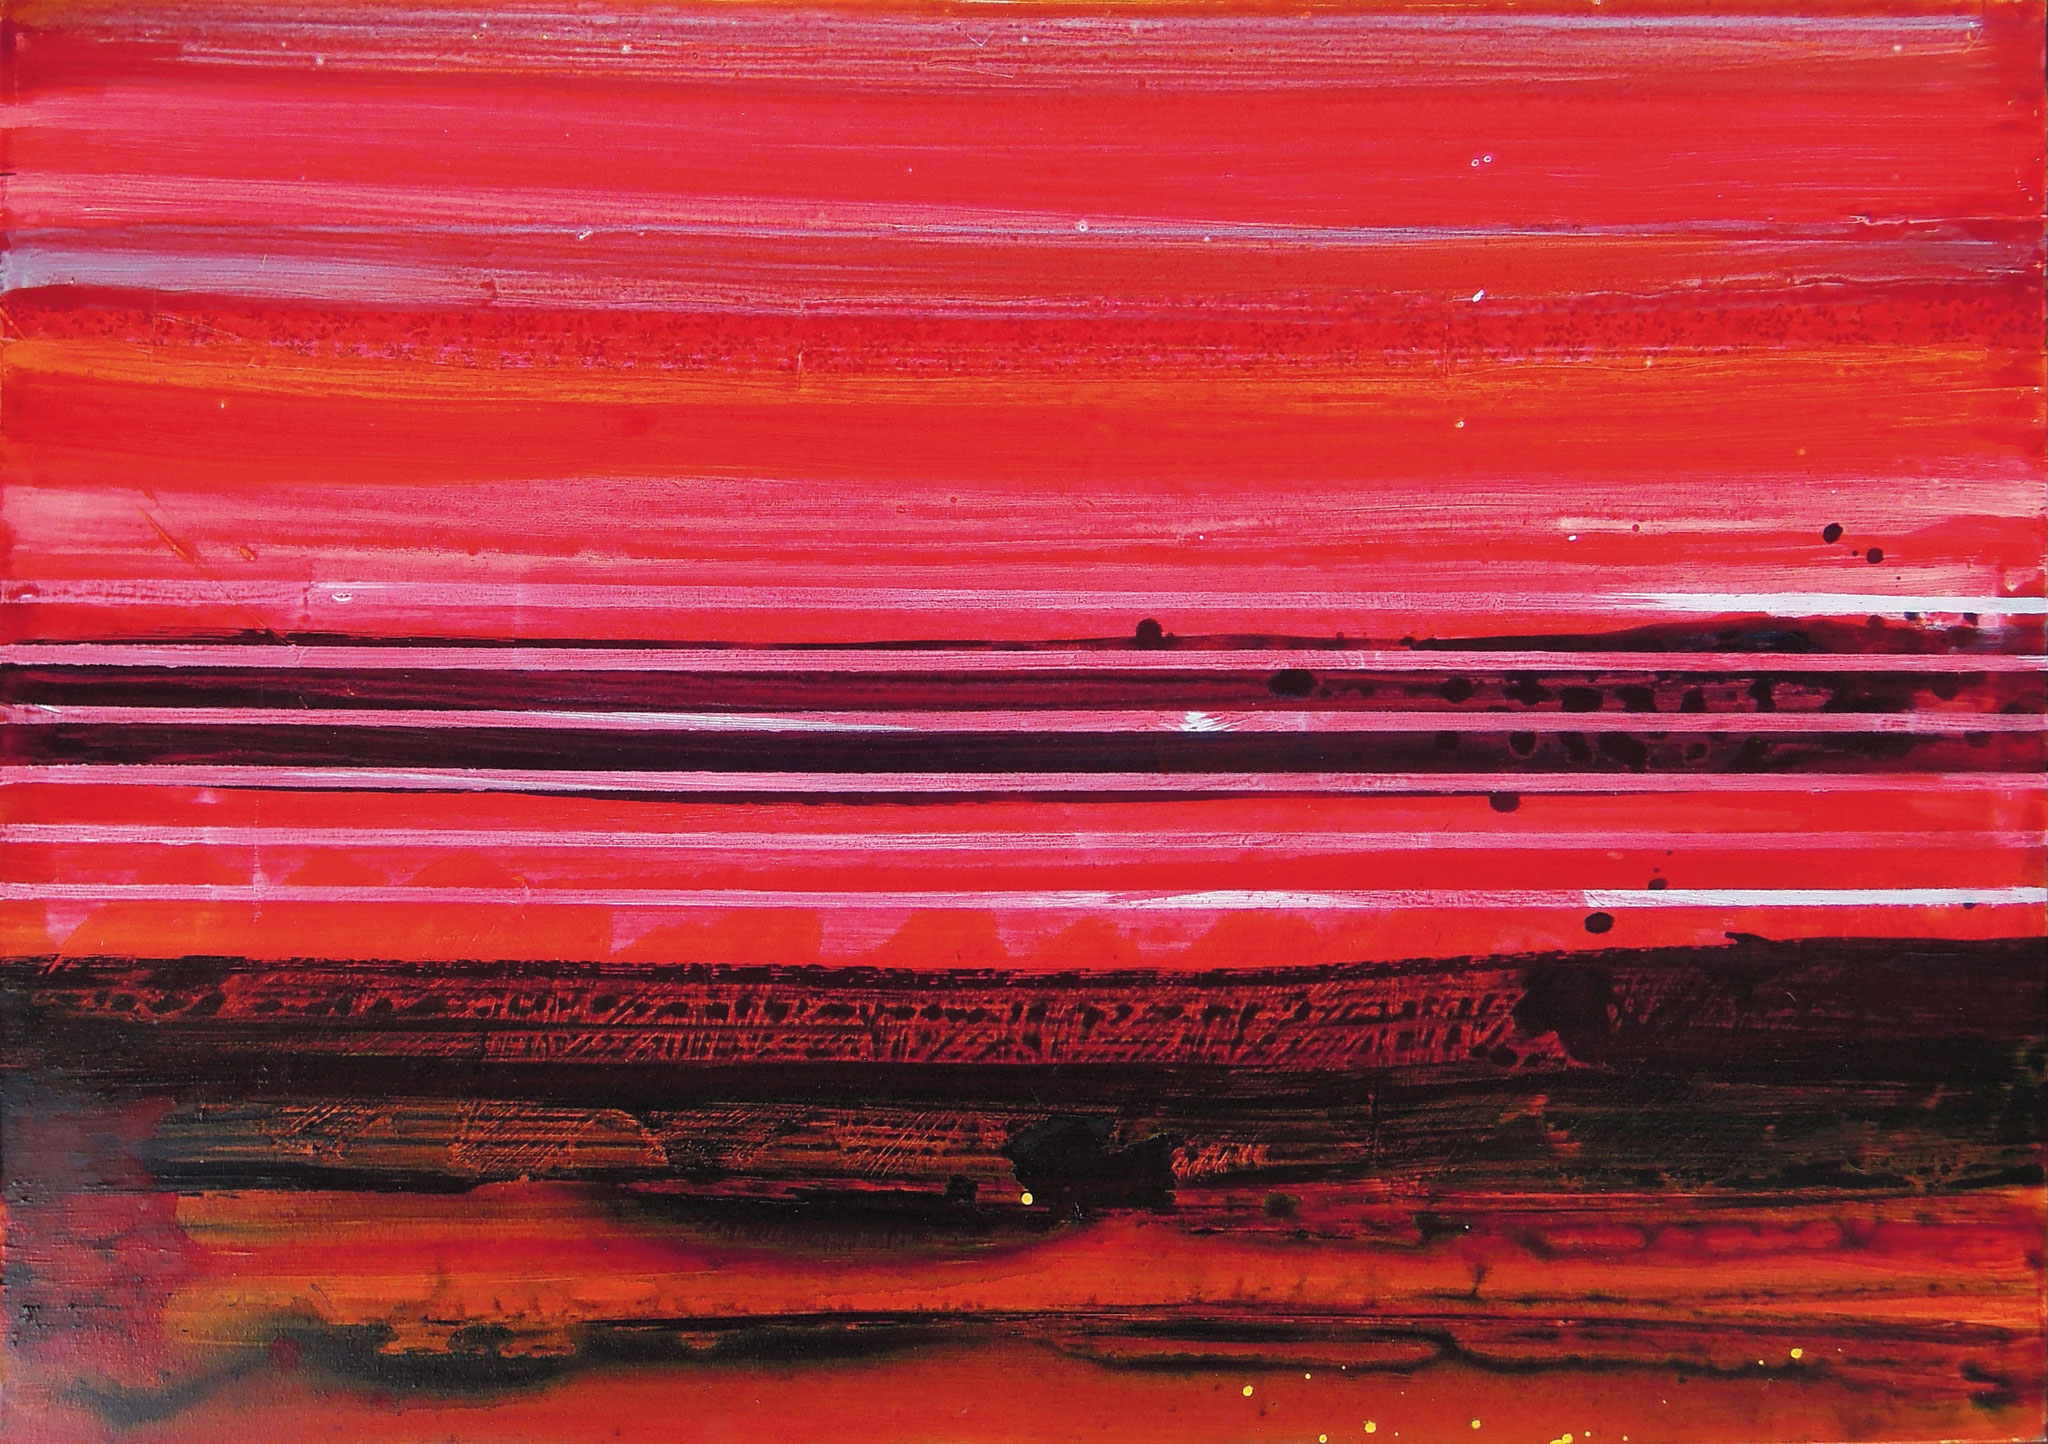 Stripes V   140x100cm 2014 Pigmente / Binder auf Leinwand